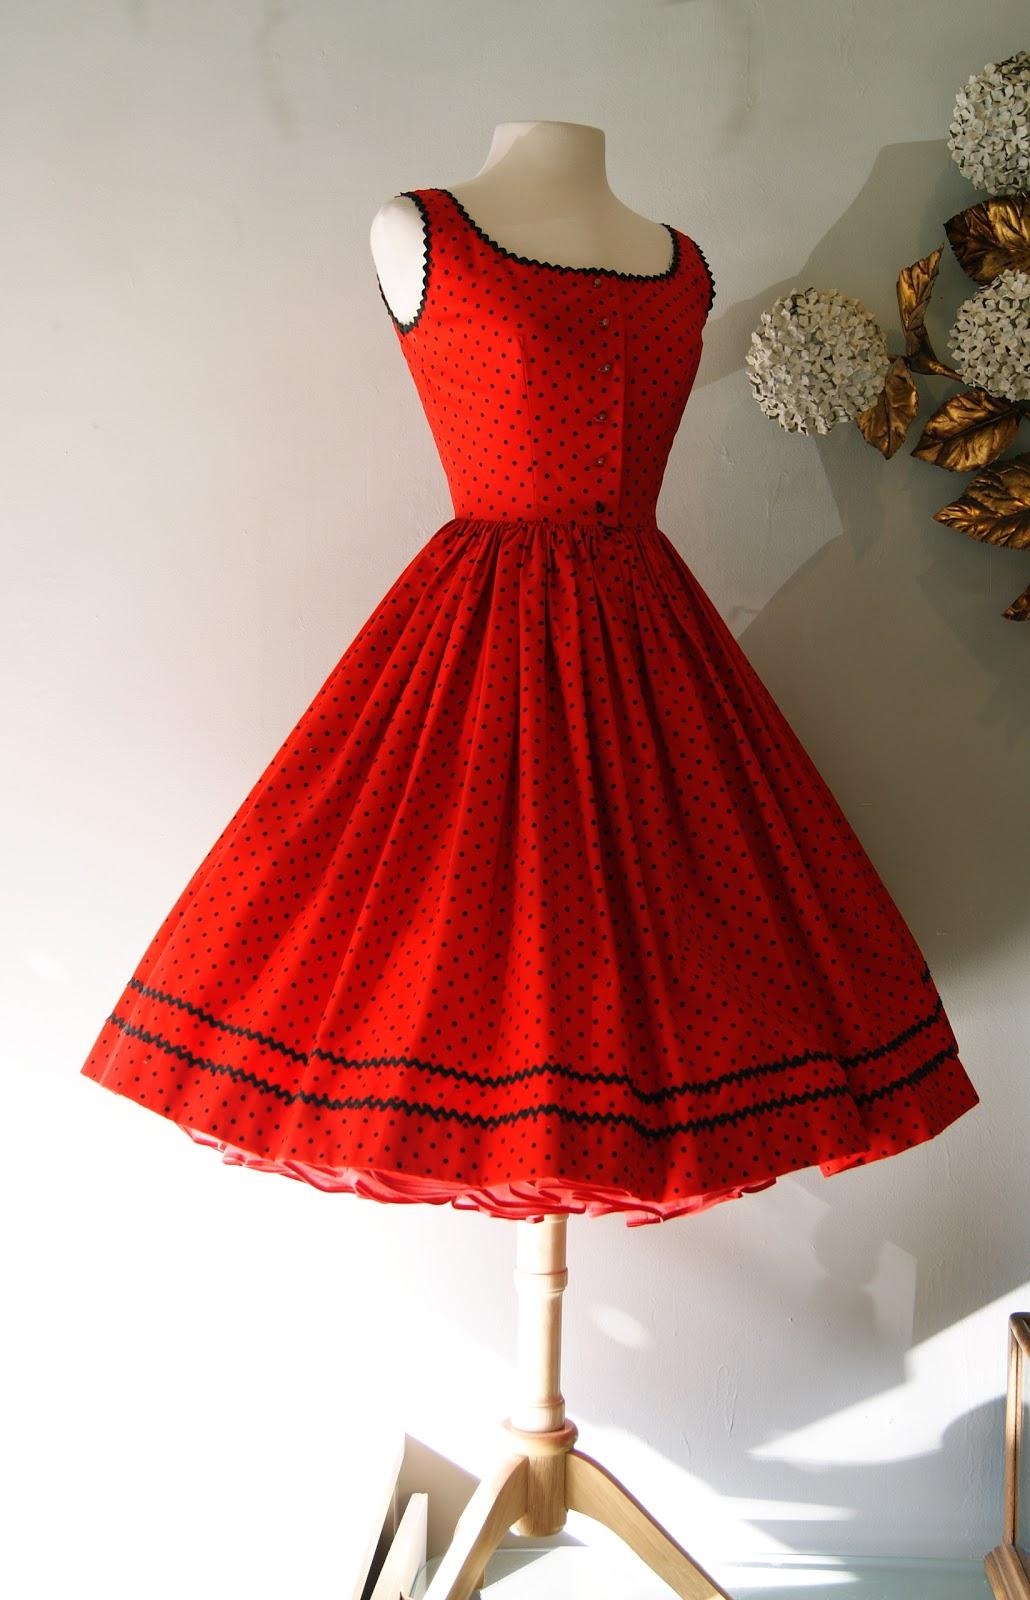 e53b3e6524 Xtabay Vintage Clothing Boutique - Portland